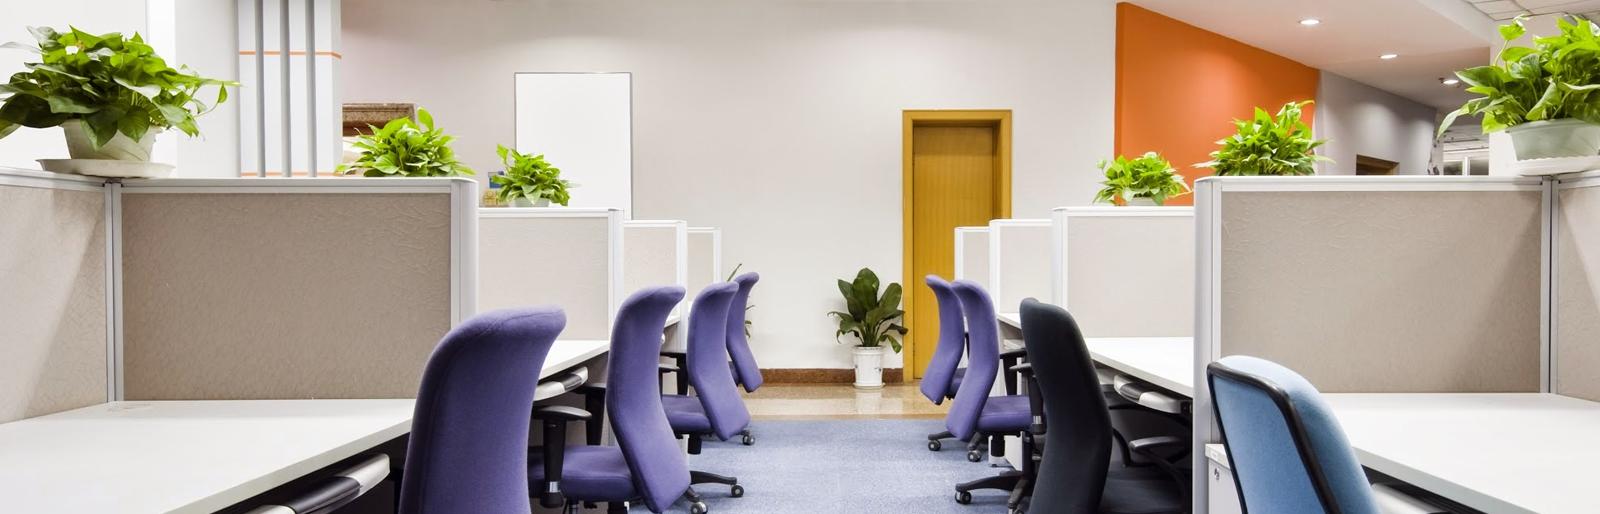 Întreținere sedii companii